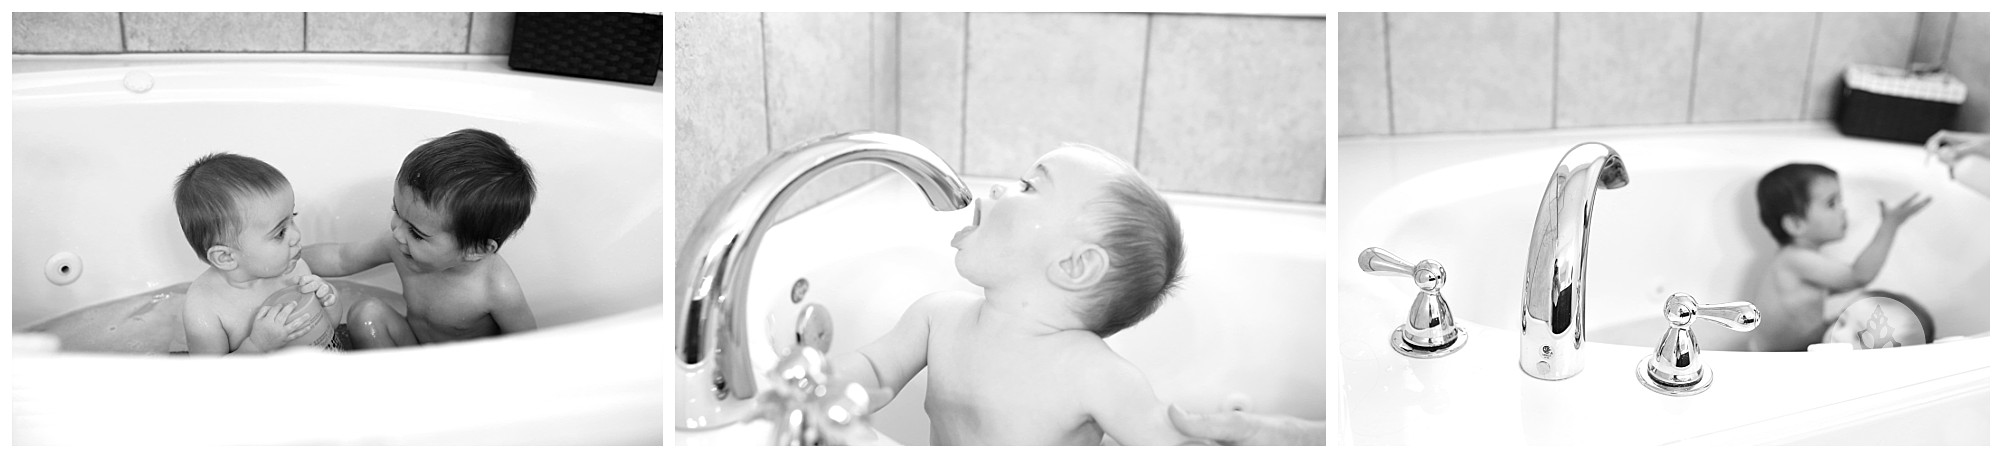 alex-shelley-photography-dfw-family-photographer-documentary-fortworth-keller-southlake-effarah048.jpg